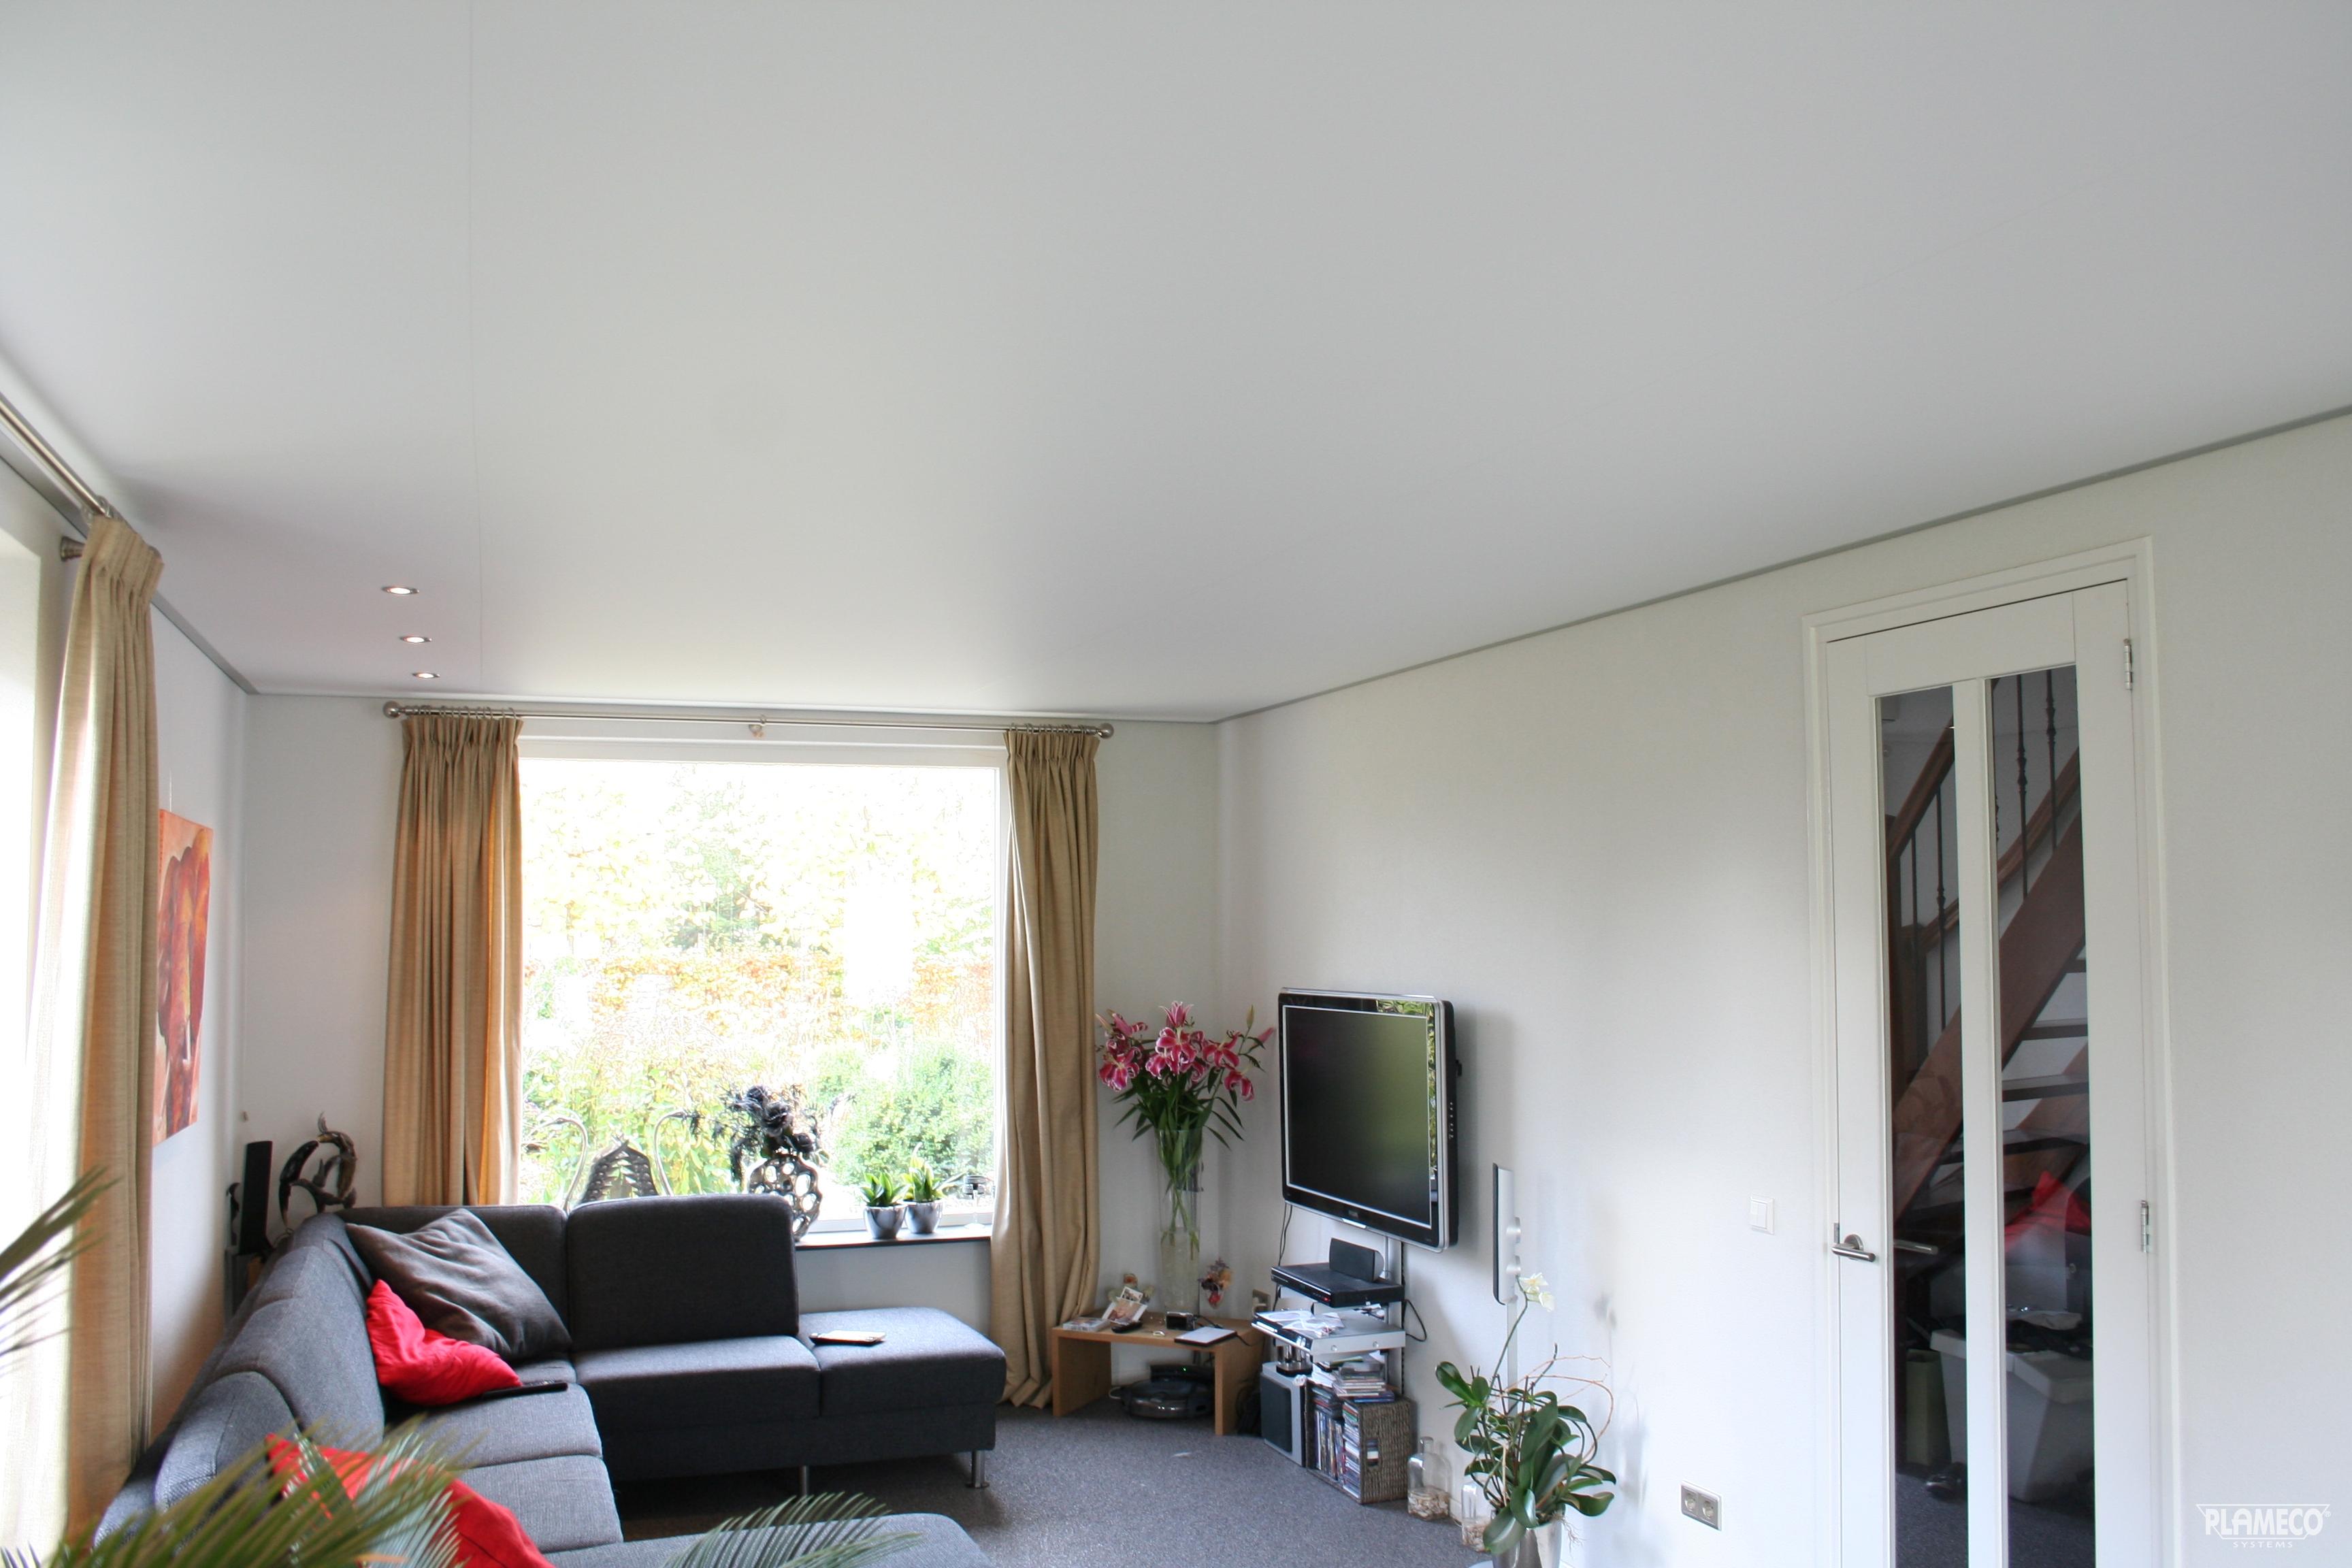 spanndecken matt plameco beckmann. Black Bedroom Furniture Sets. Home Design Ideas